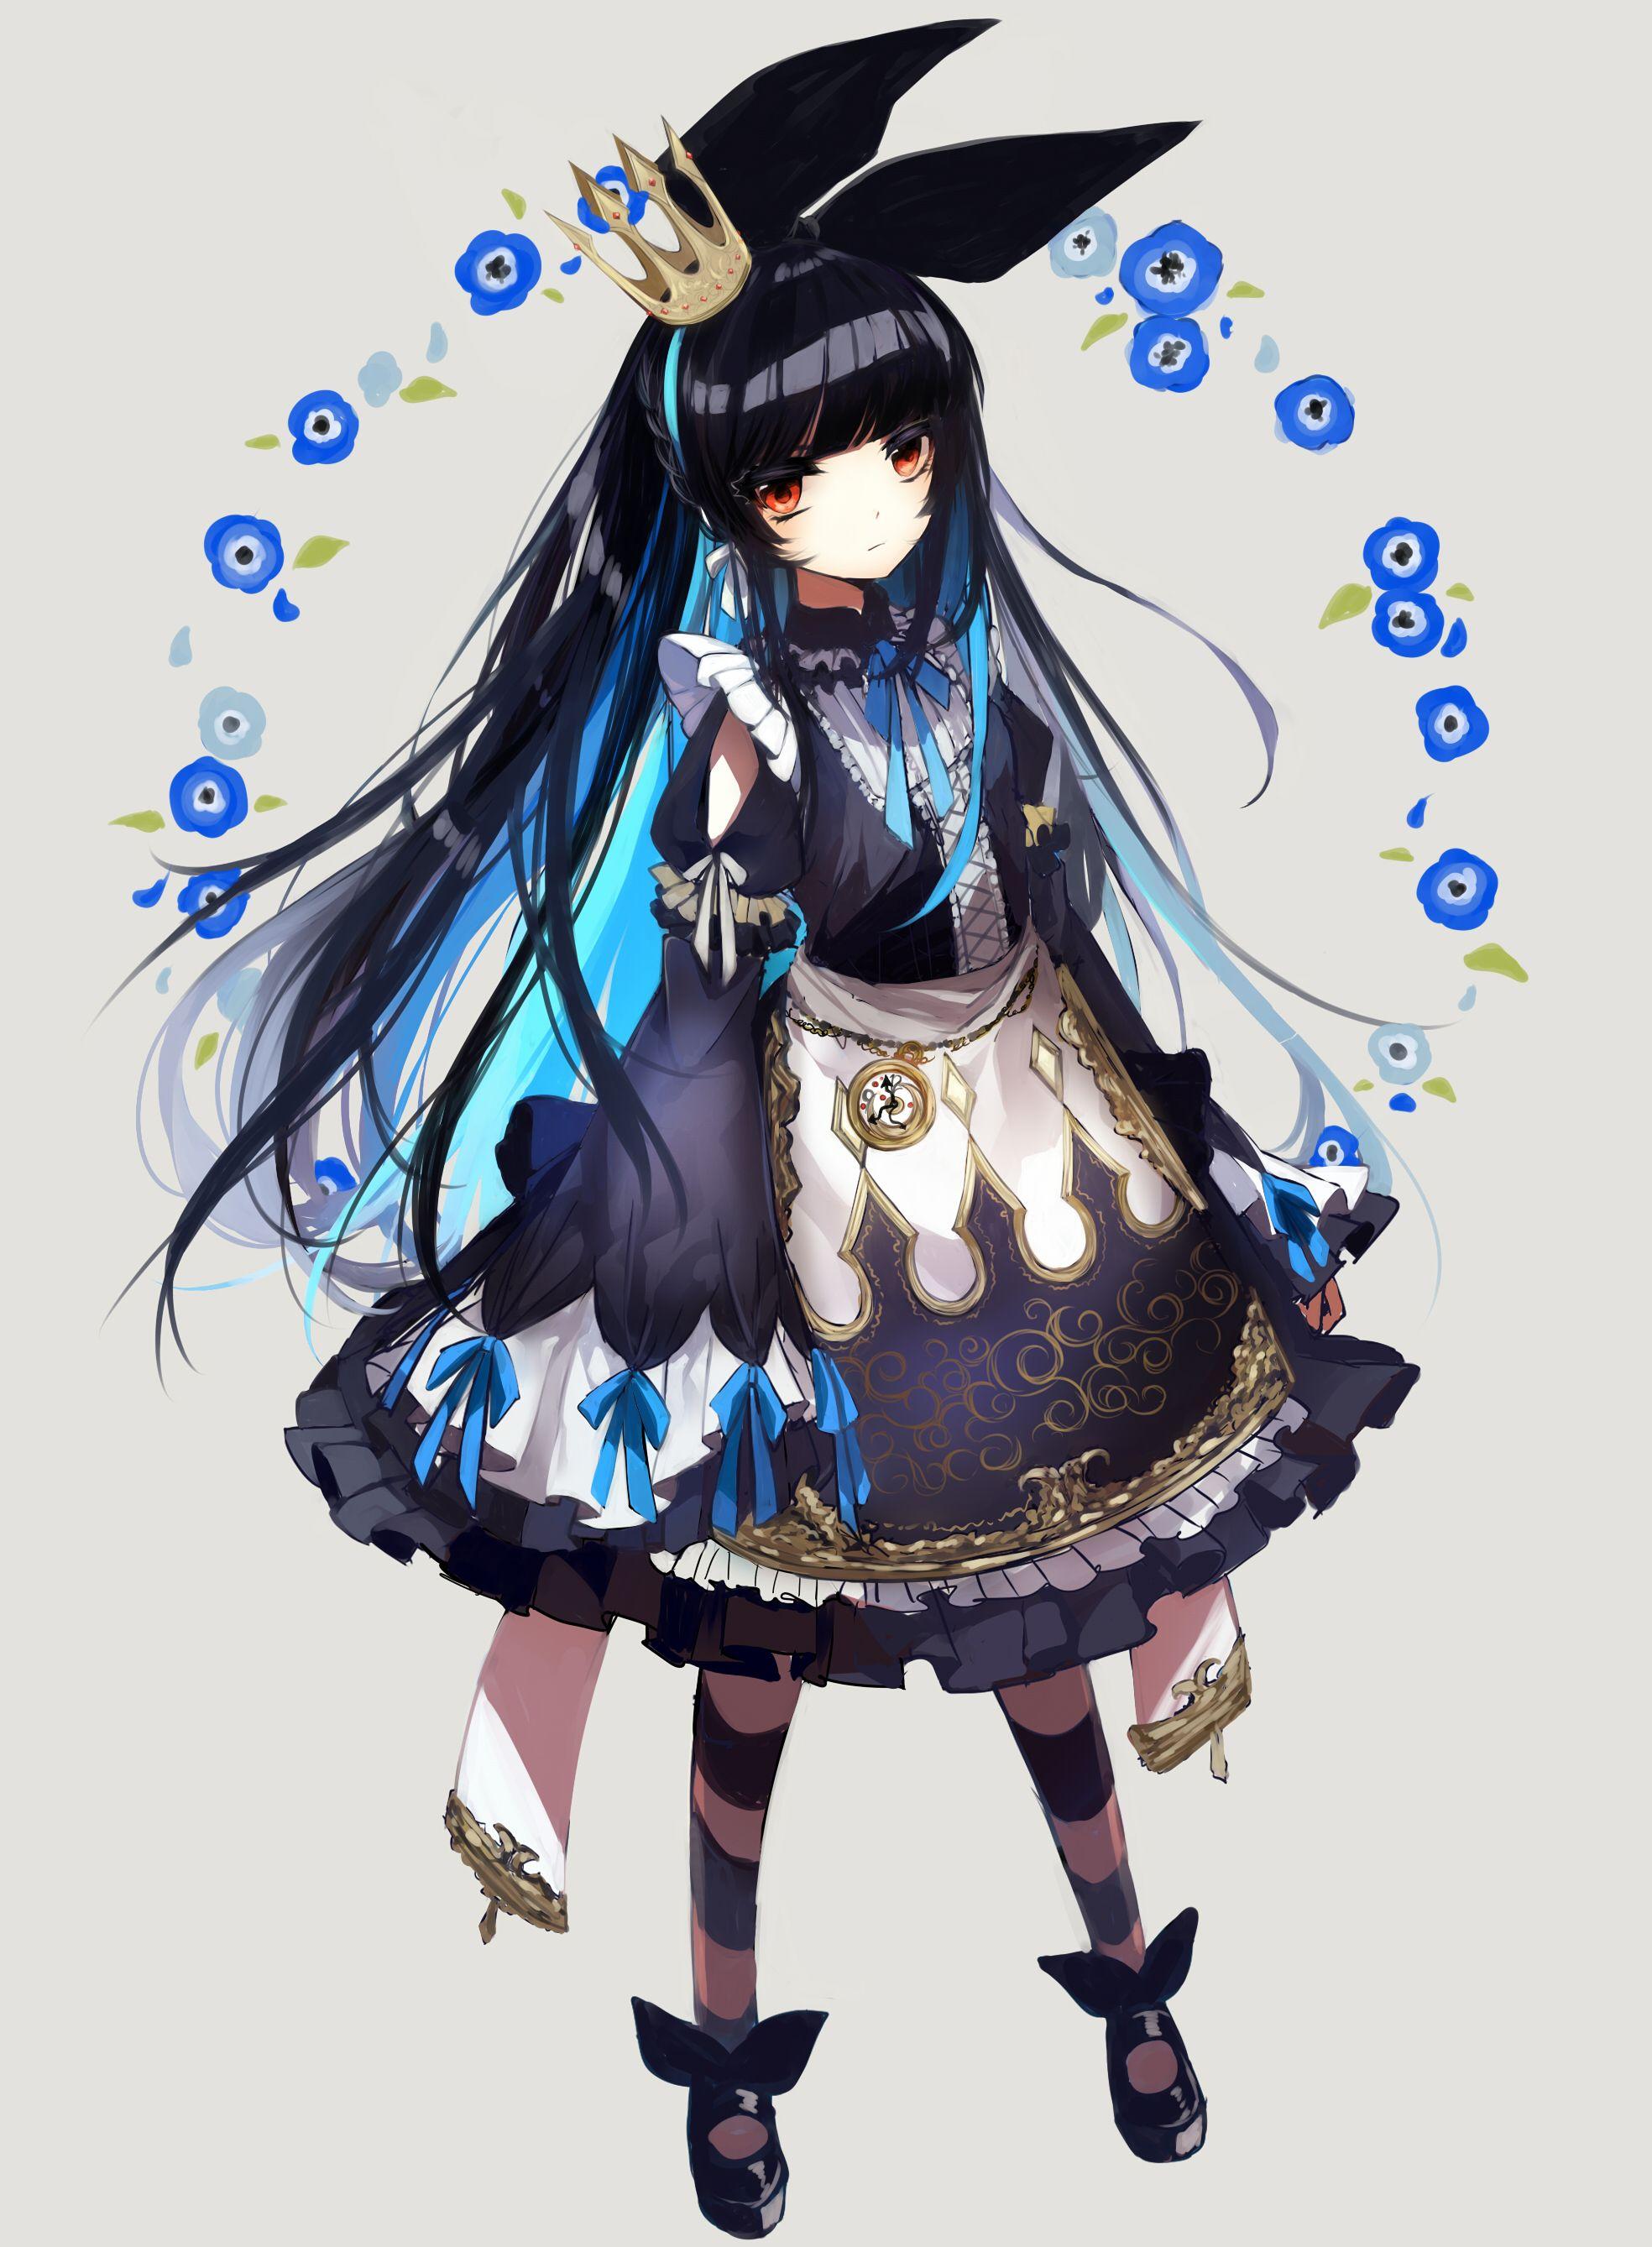 Pixiv Id 8006247/2057319 Zerochan アニメの女の子, キャラクターデザイン